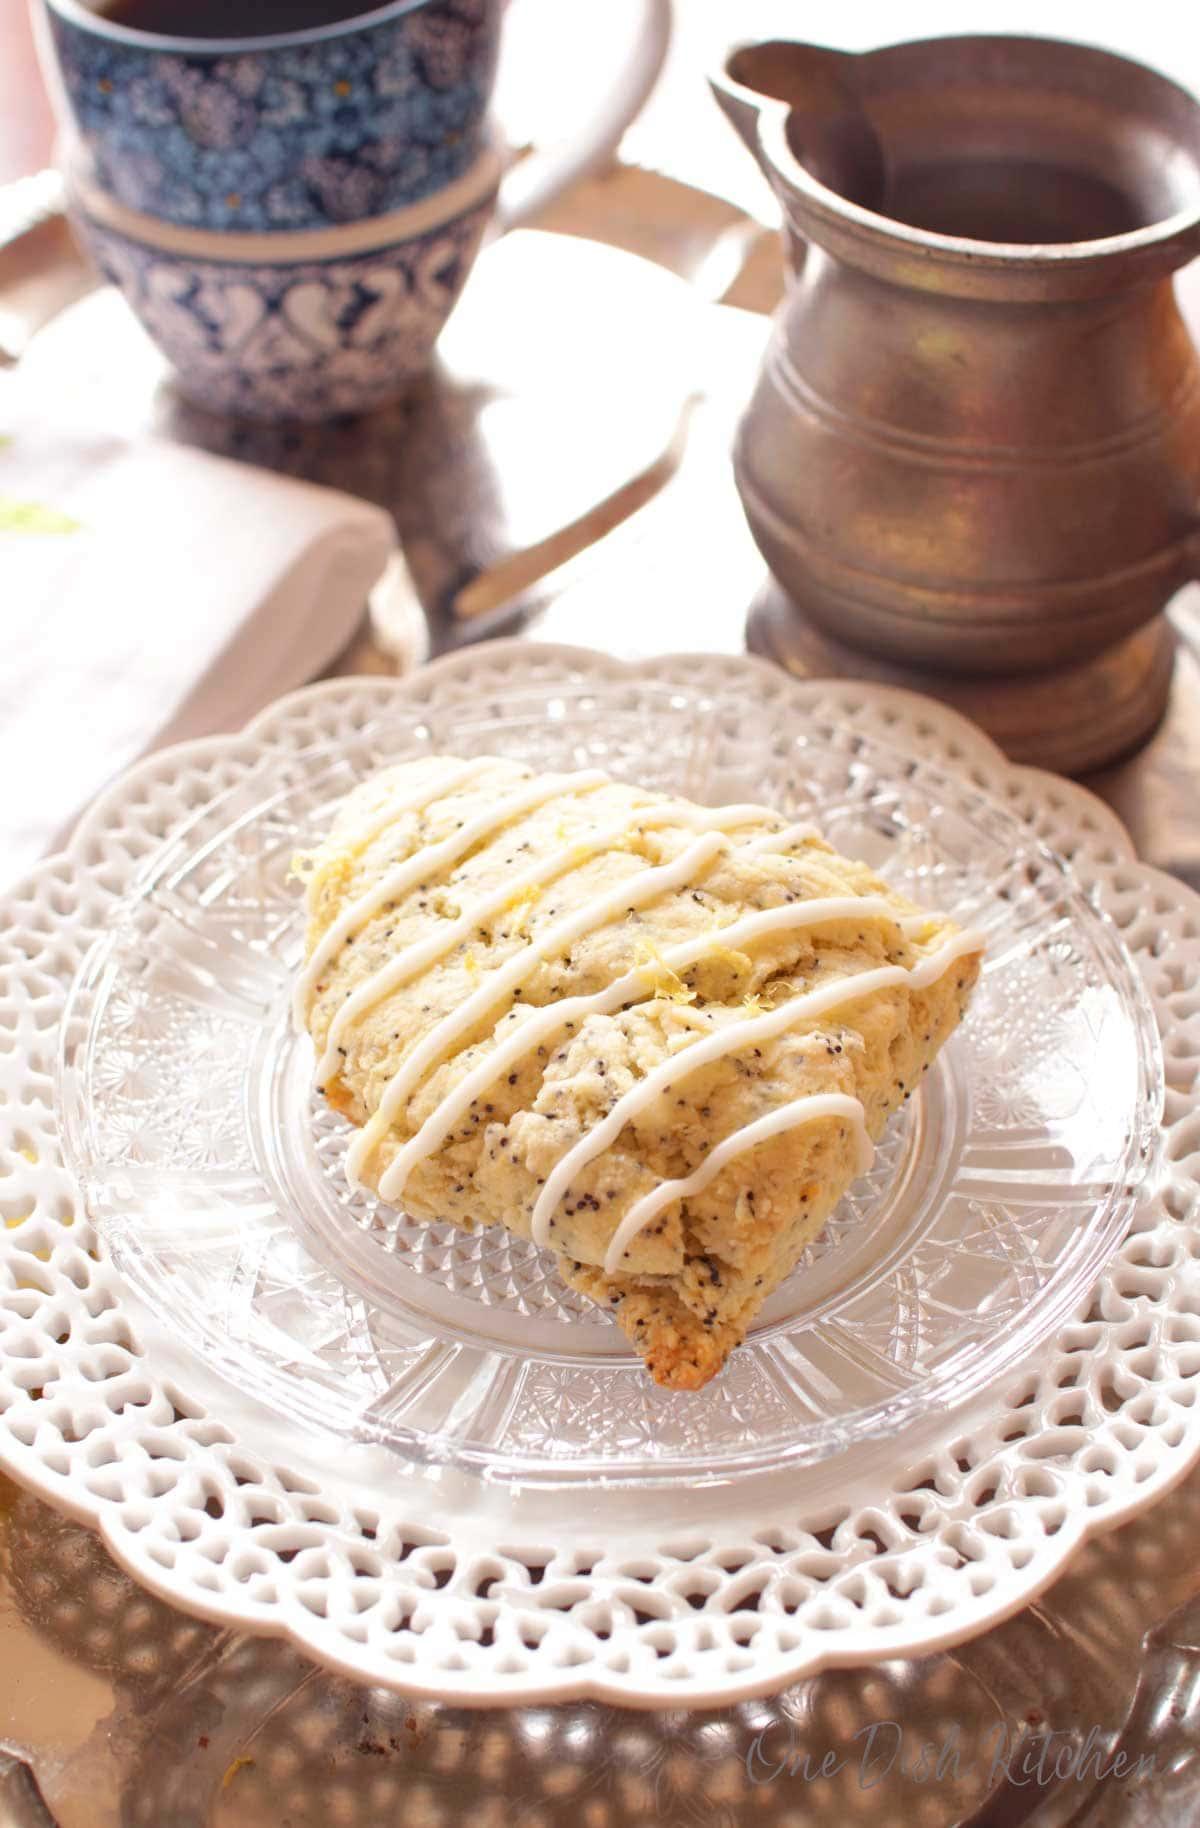 one lemon glazed scone on a plate near a cup of coffee.